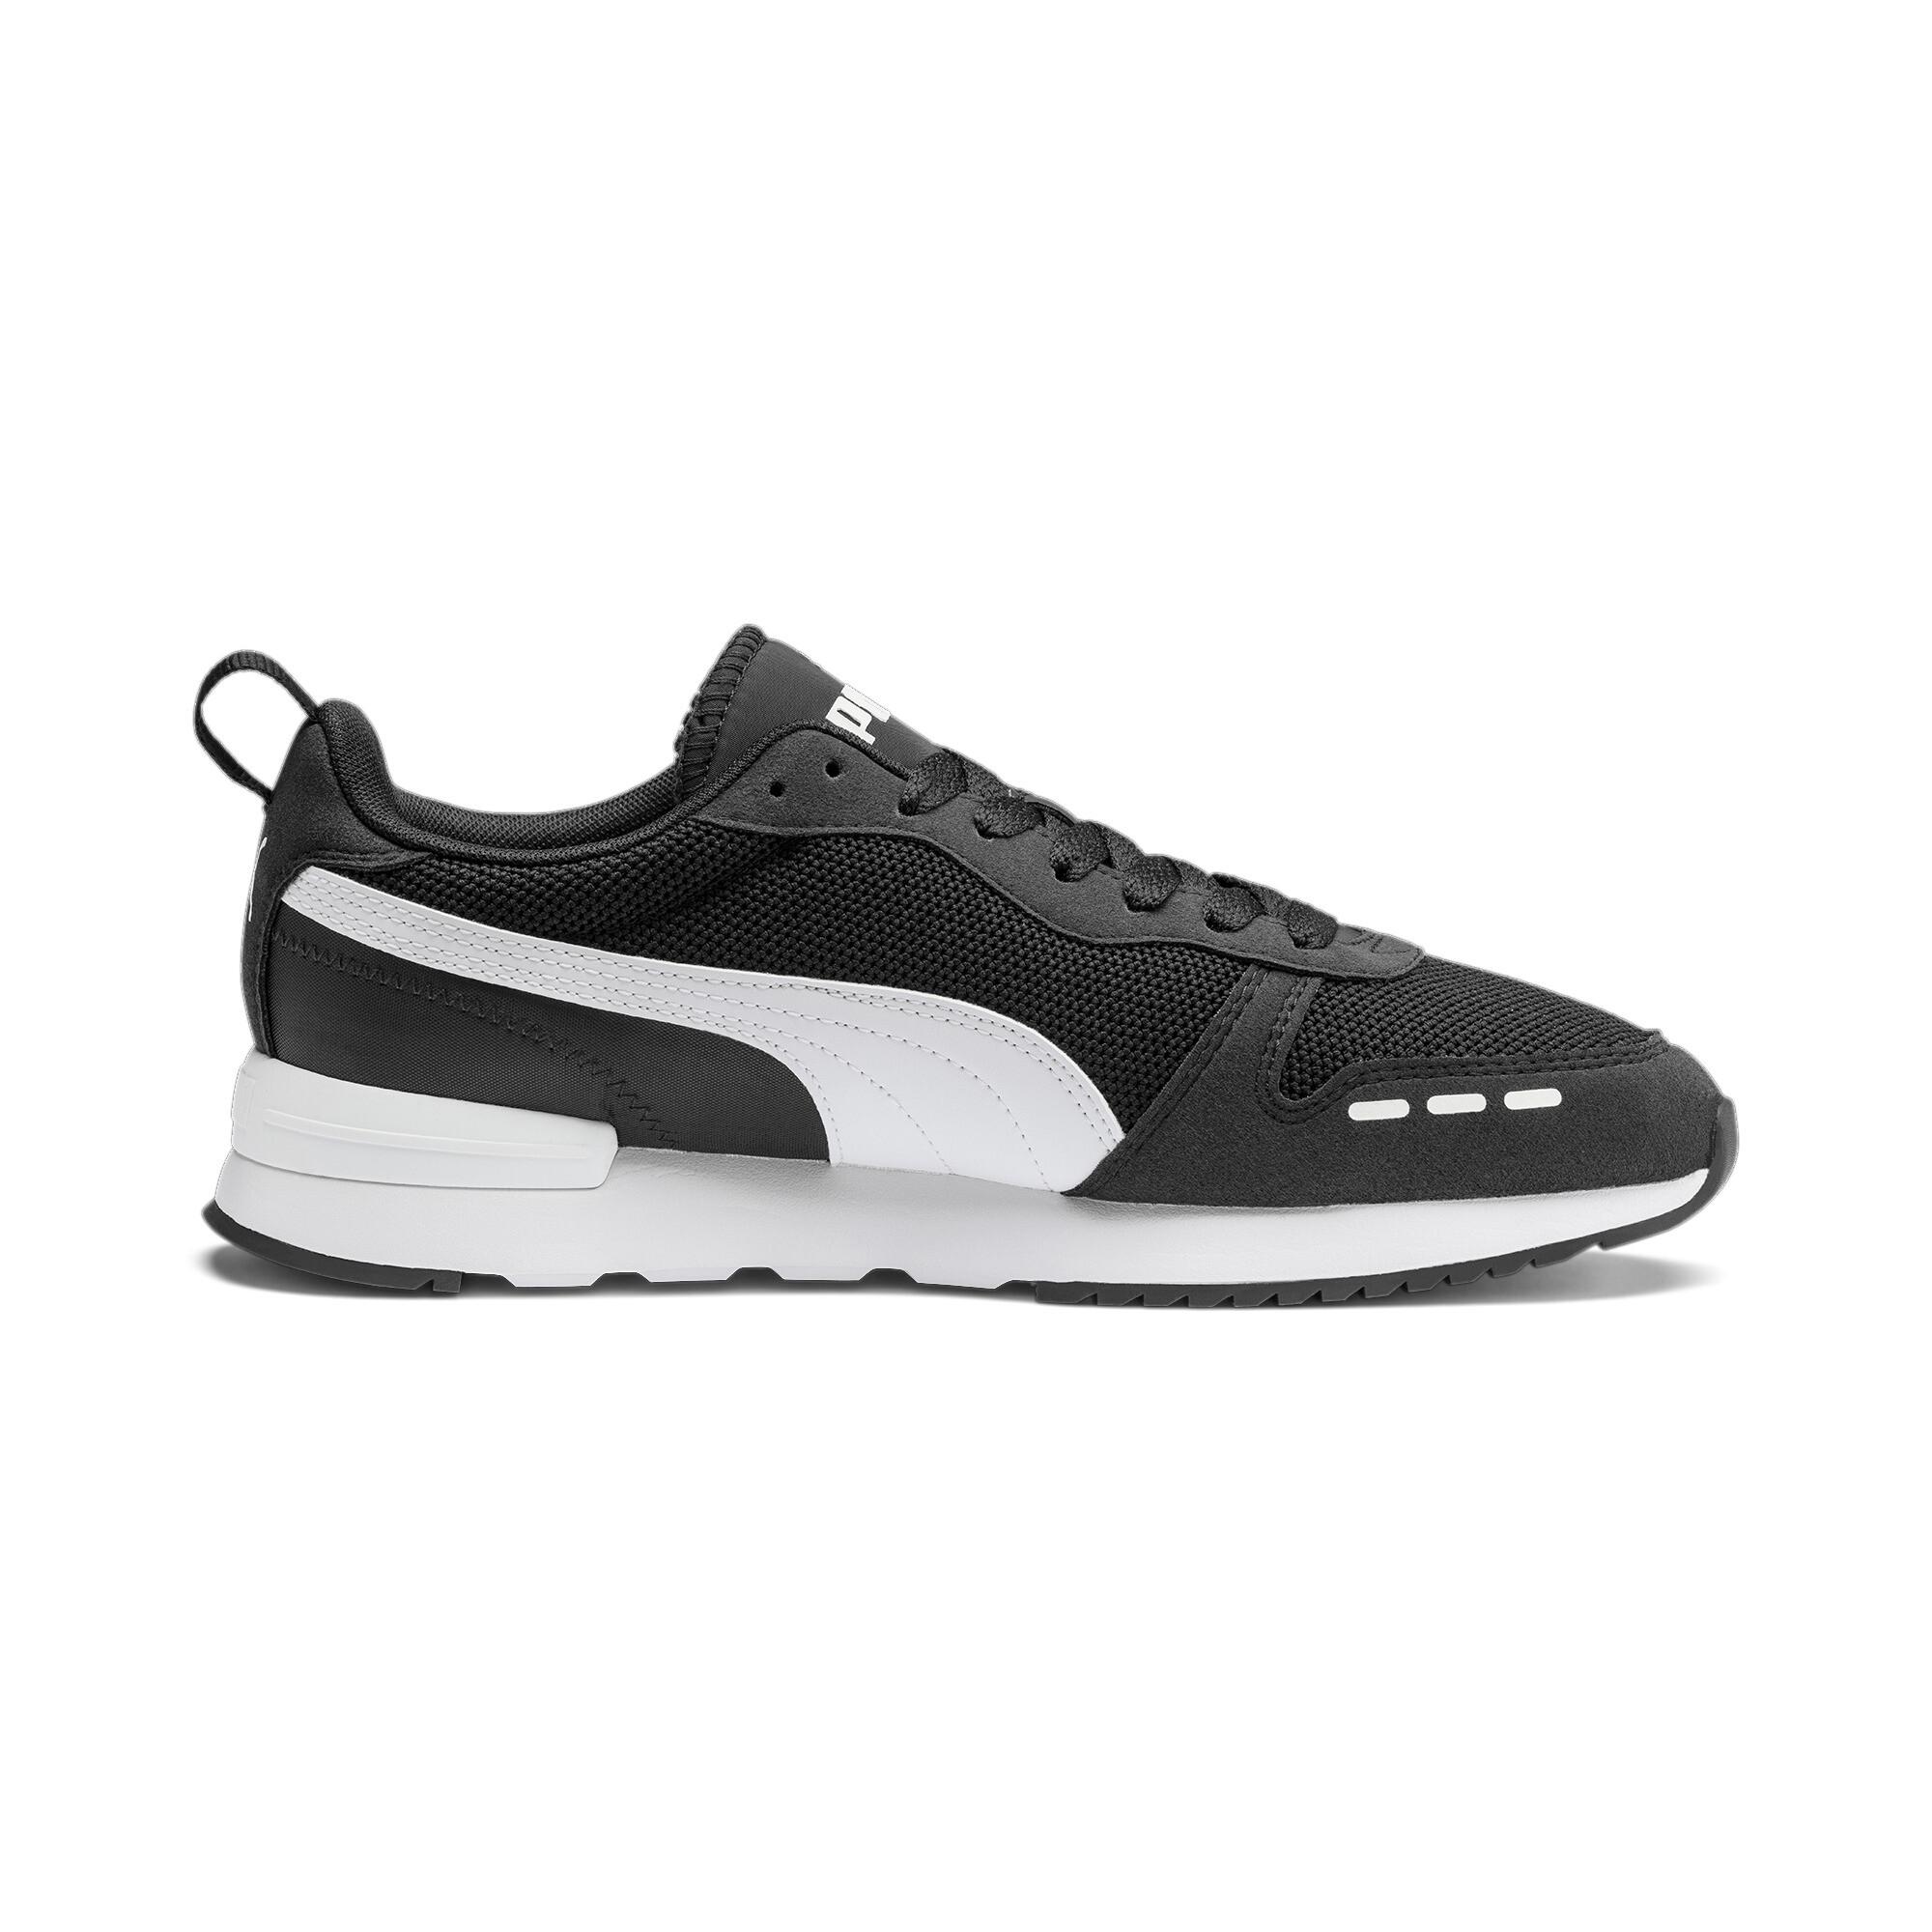 thumbnail 16 - PUMA-Men-039-s-R78-Sneakers